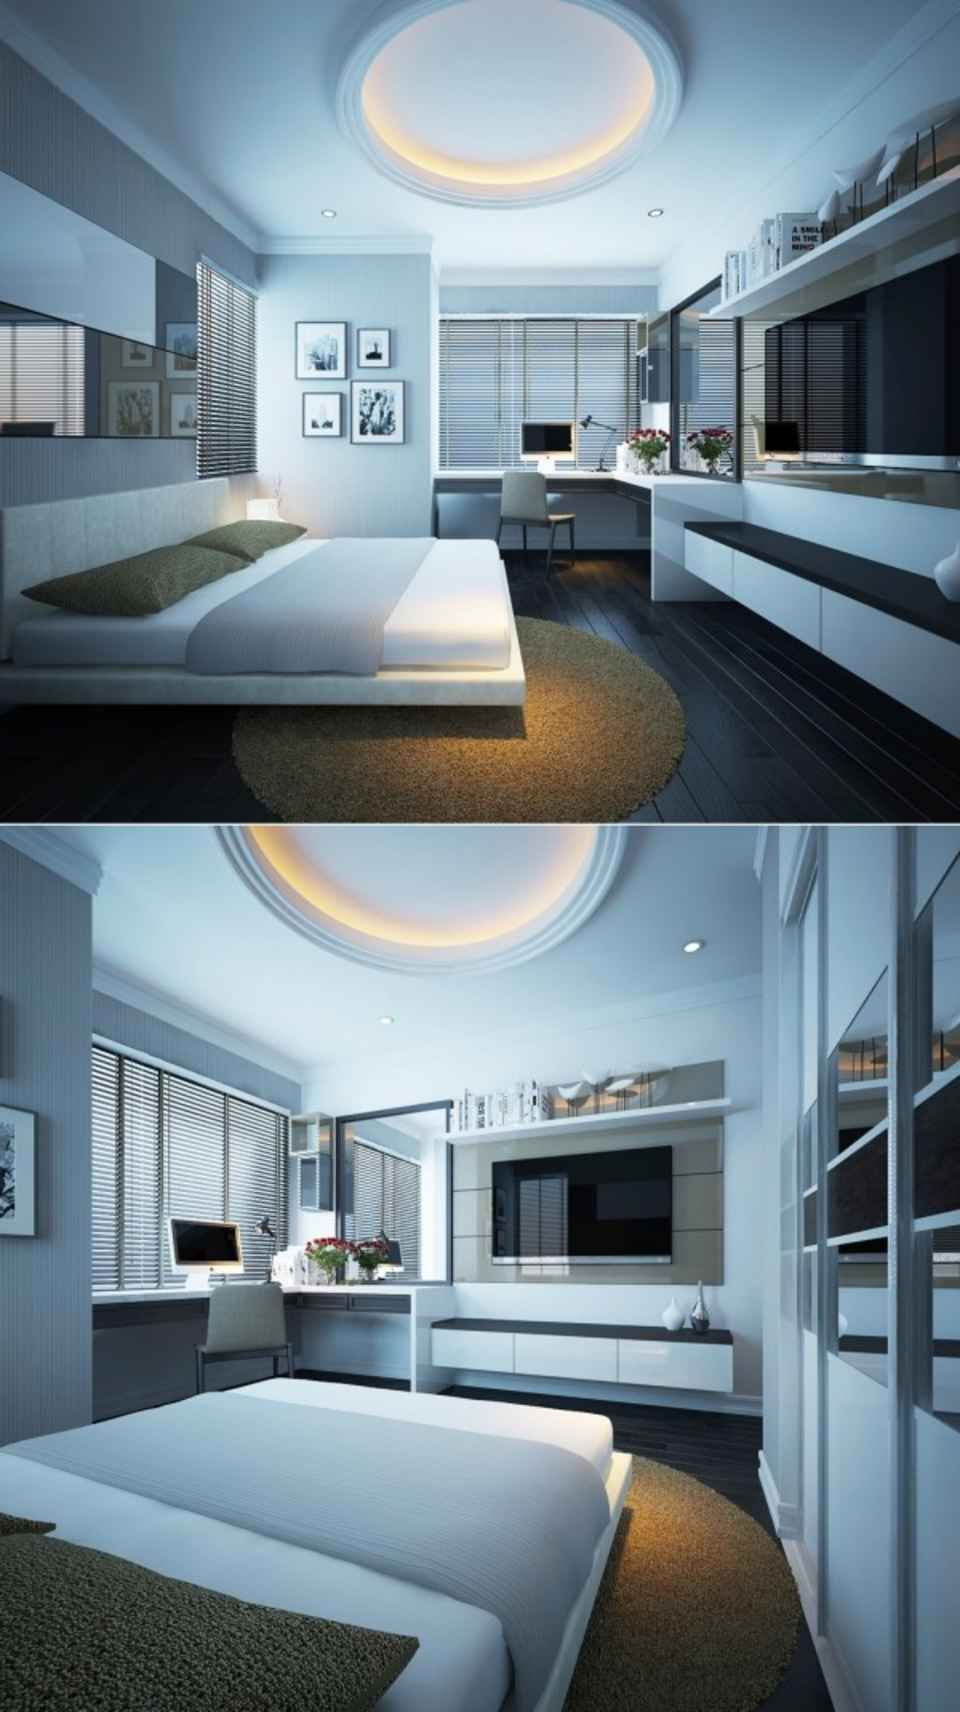 100 Modern Interiors Chambre Design Chambres A Coucher Modernes Chambre A Coucher